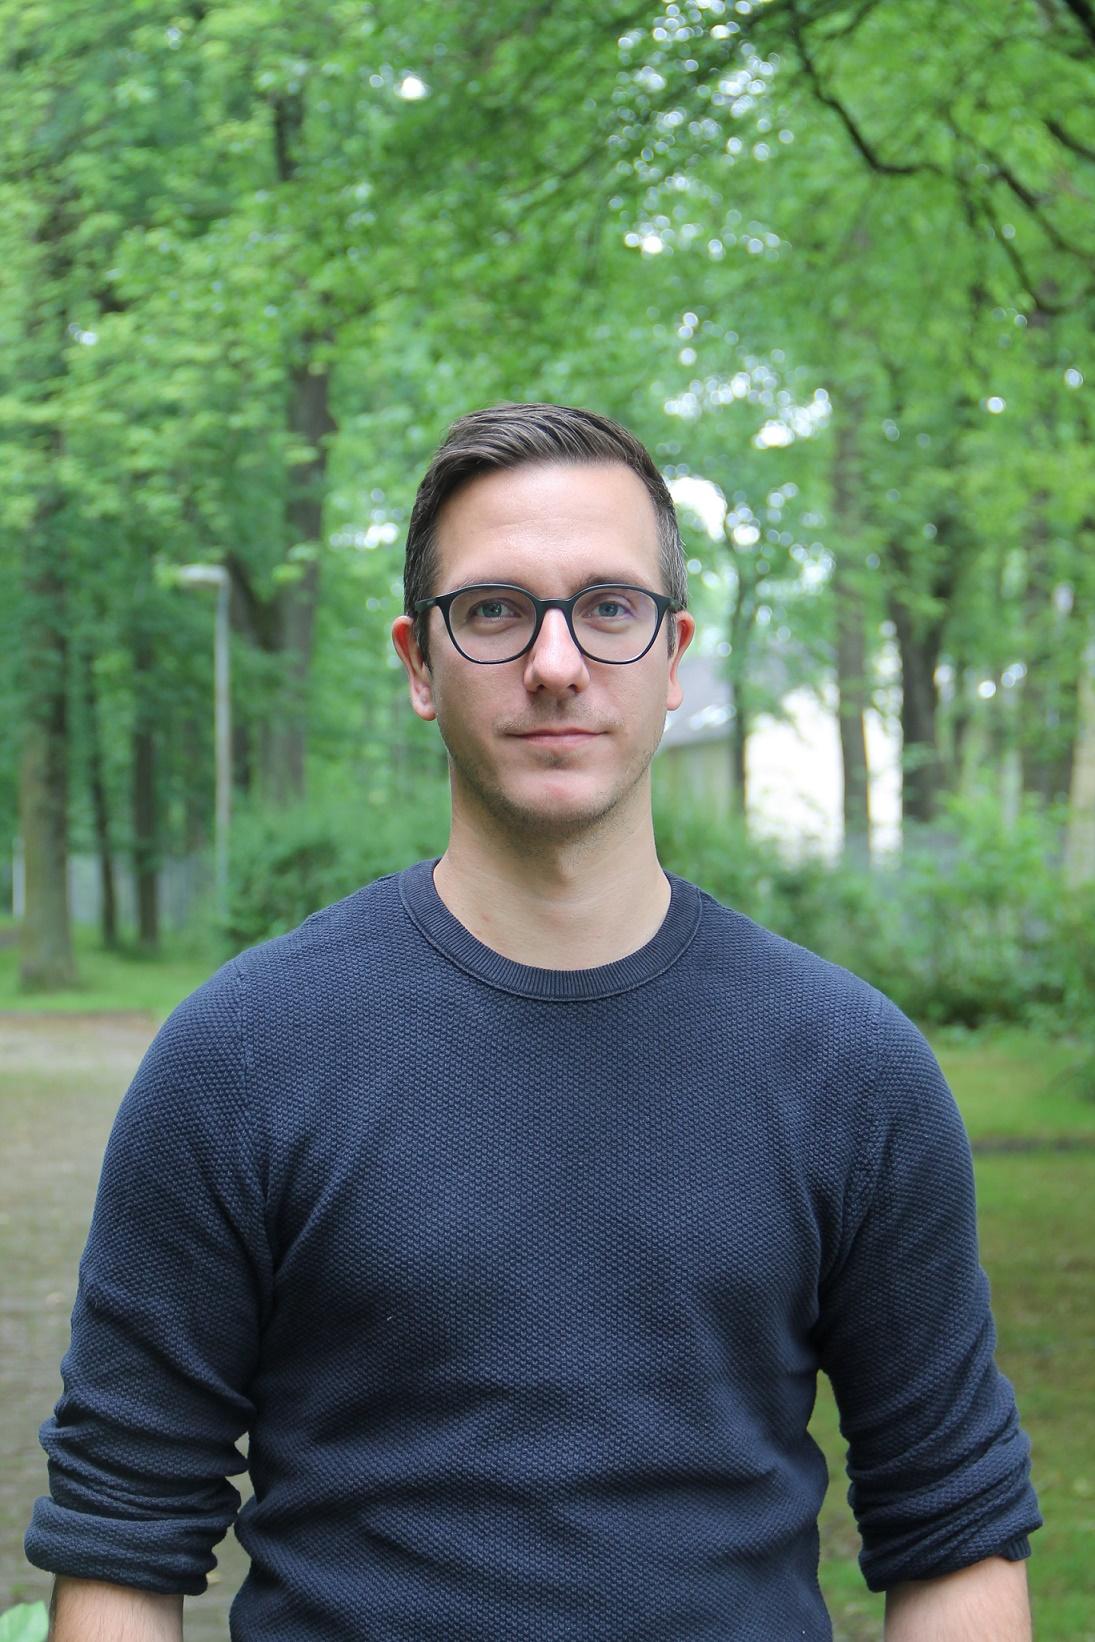 Gerrit Benson, Schulsozialarbeiterin der Katholischen Hauptschule Marl